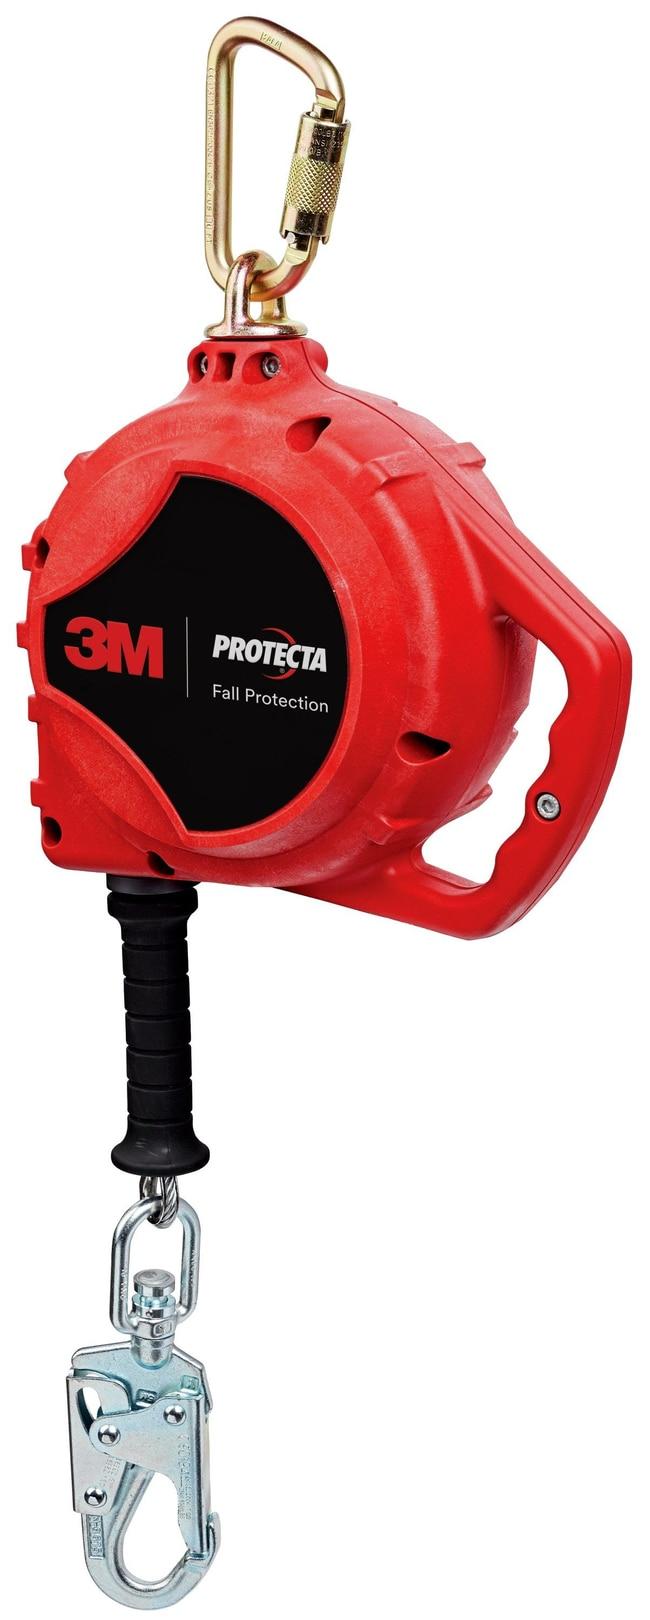 3M PROTECTA Rebel Self Retracting Lifeline - Cable Length English: 33 ft.,